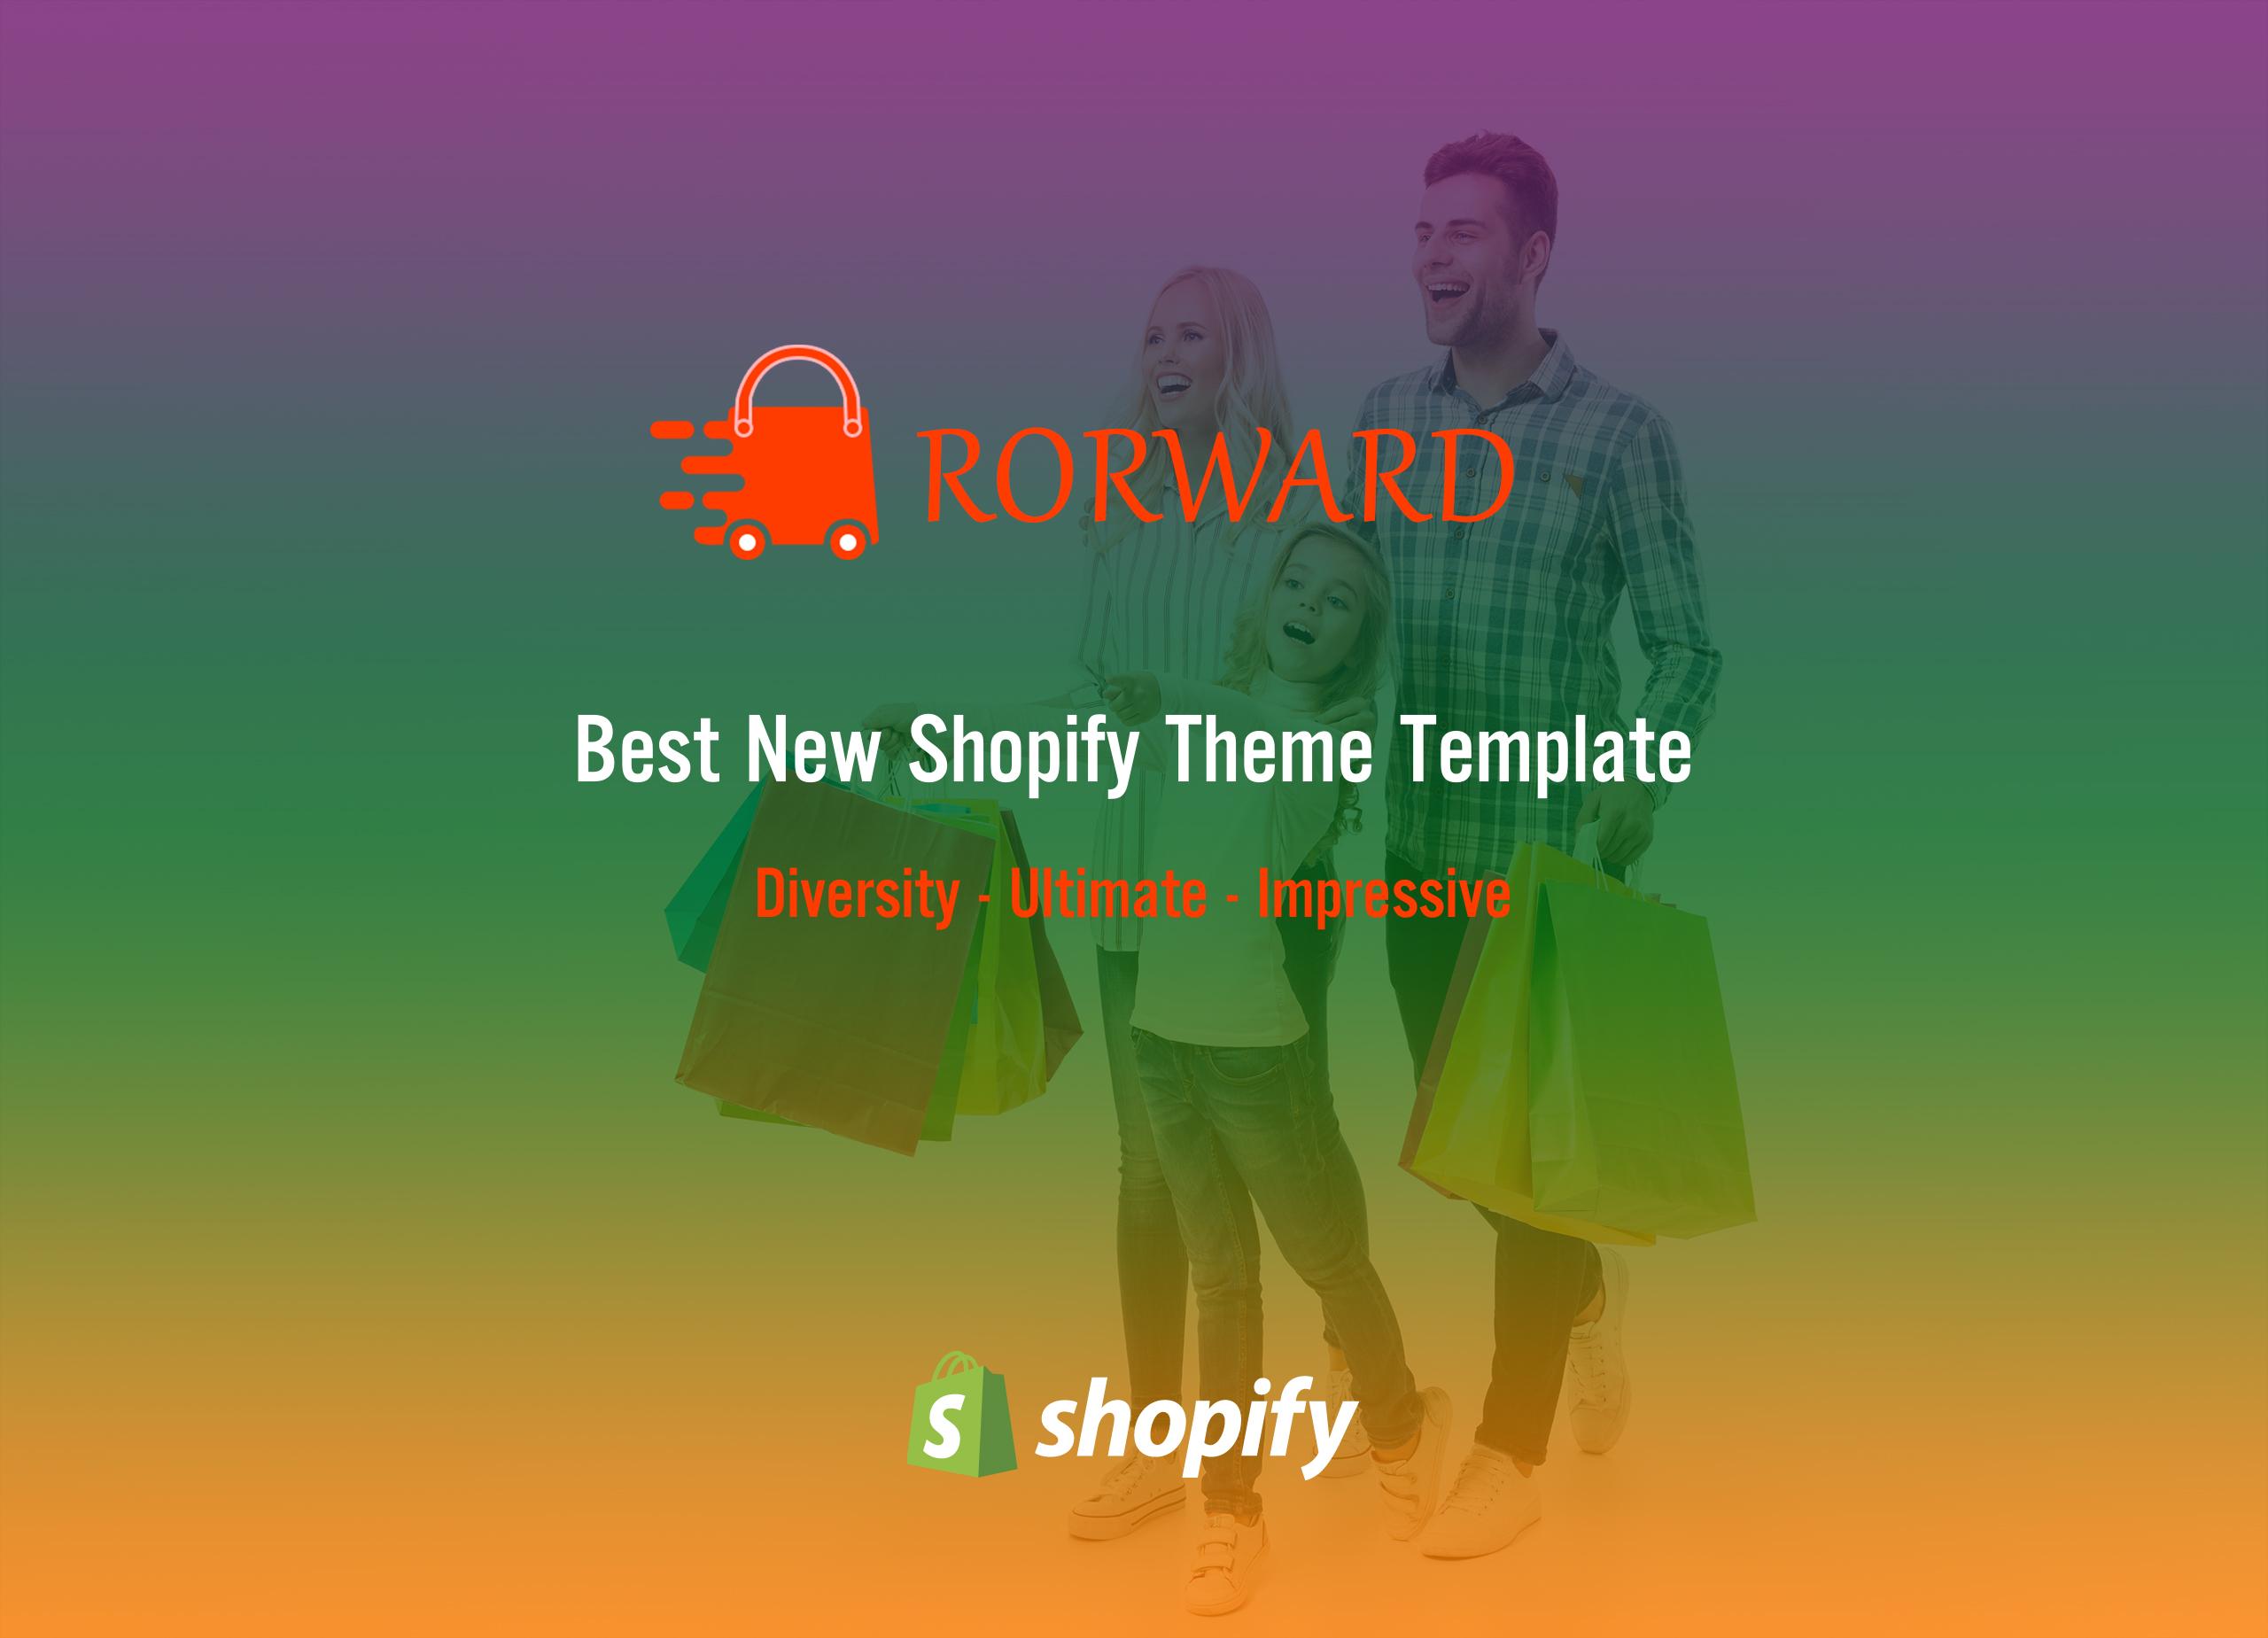 Rorward - Responisve Shopify Theme